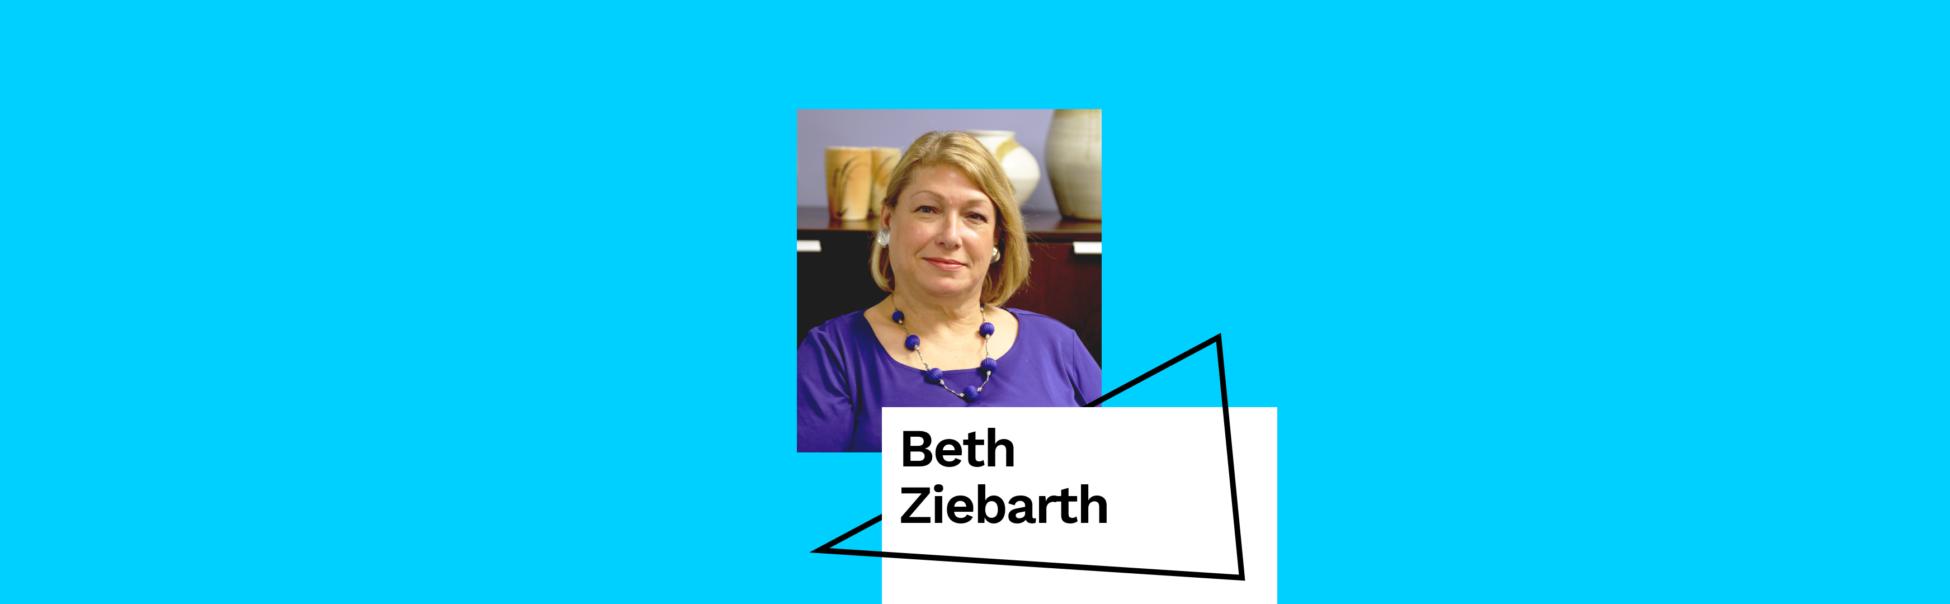 Beth Ziebarth